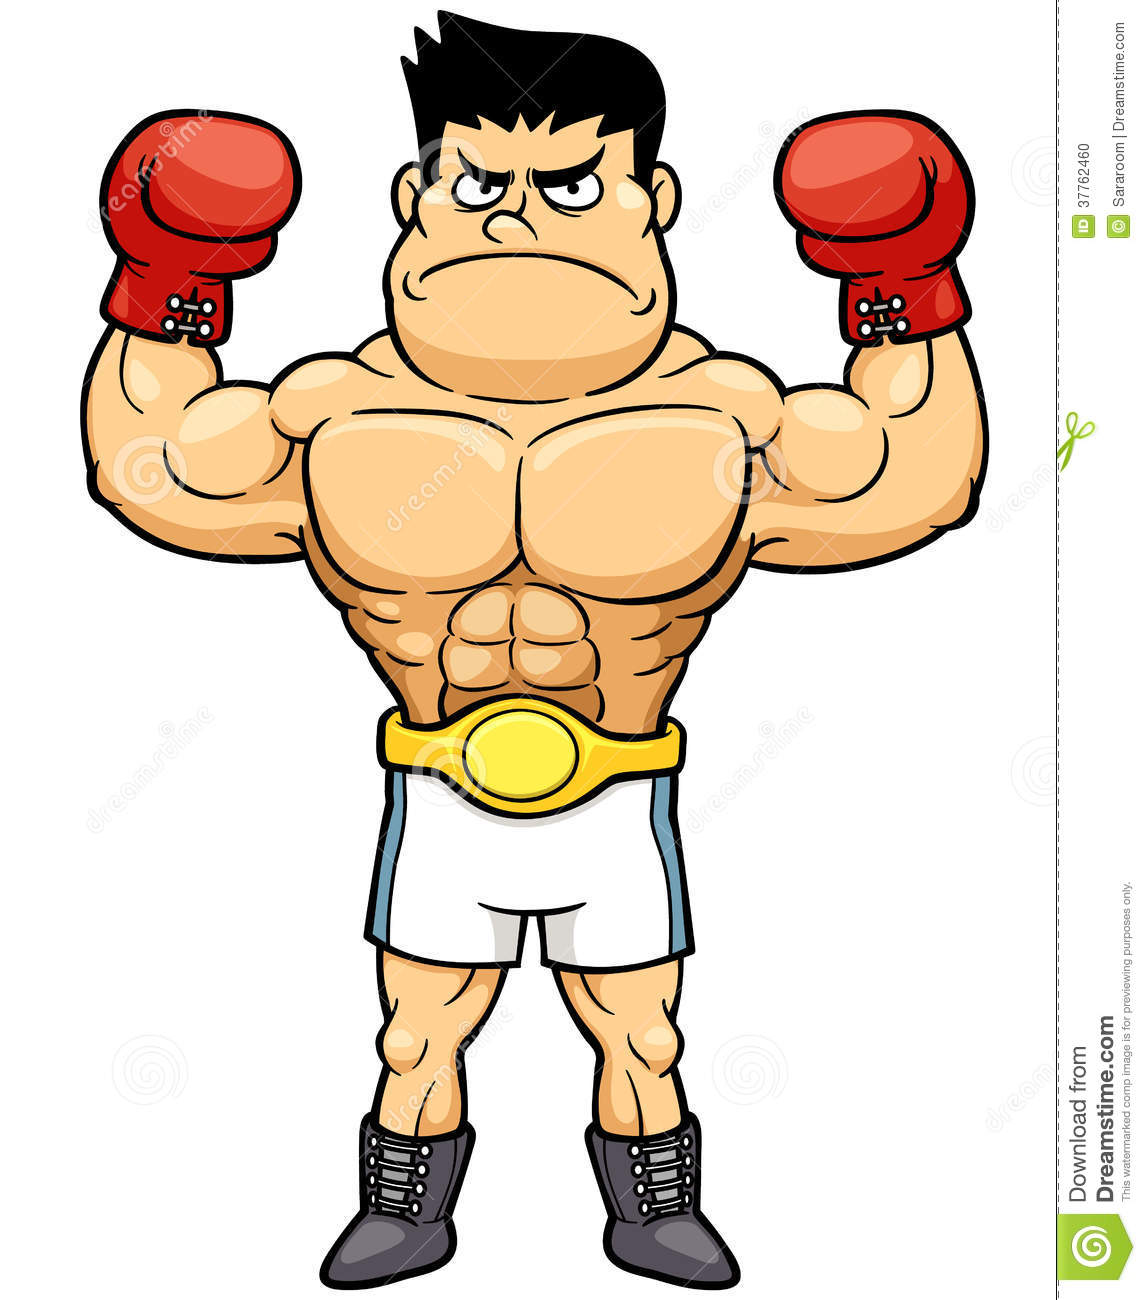 Boxer free download best. Wrestlers clipart wrestling champion